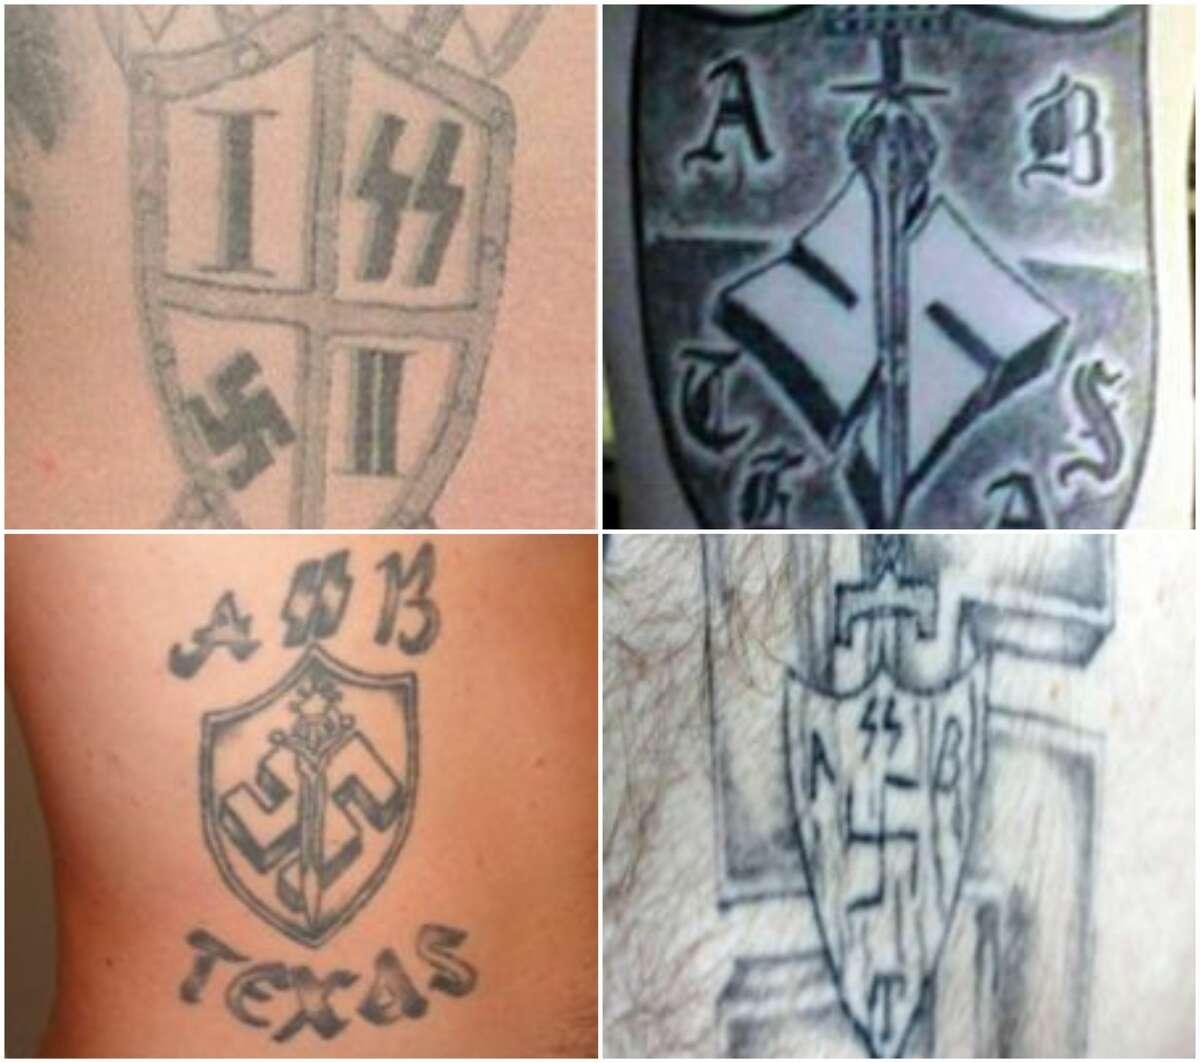 Swastika &